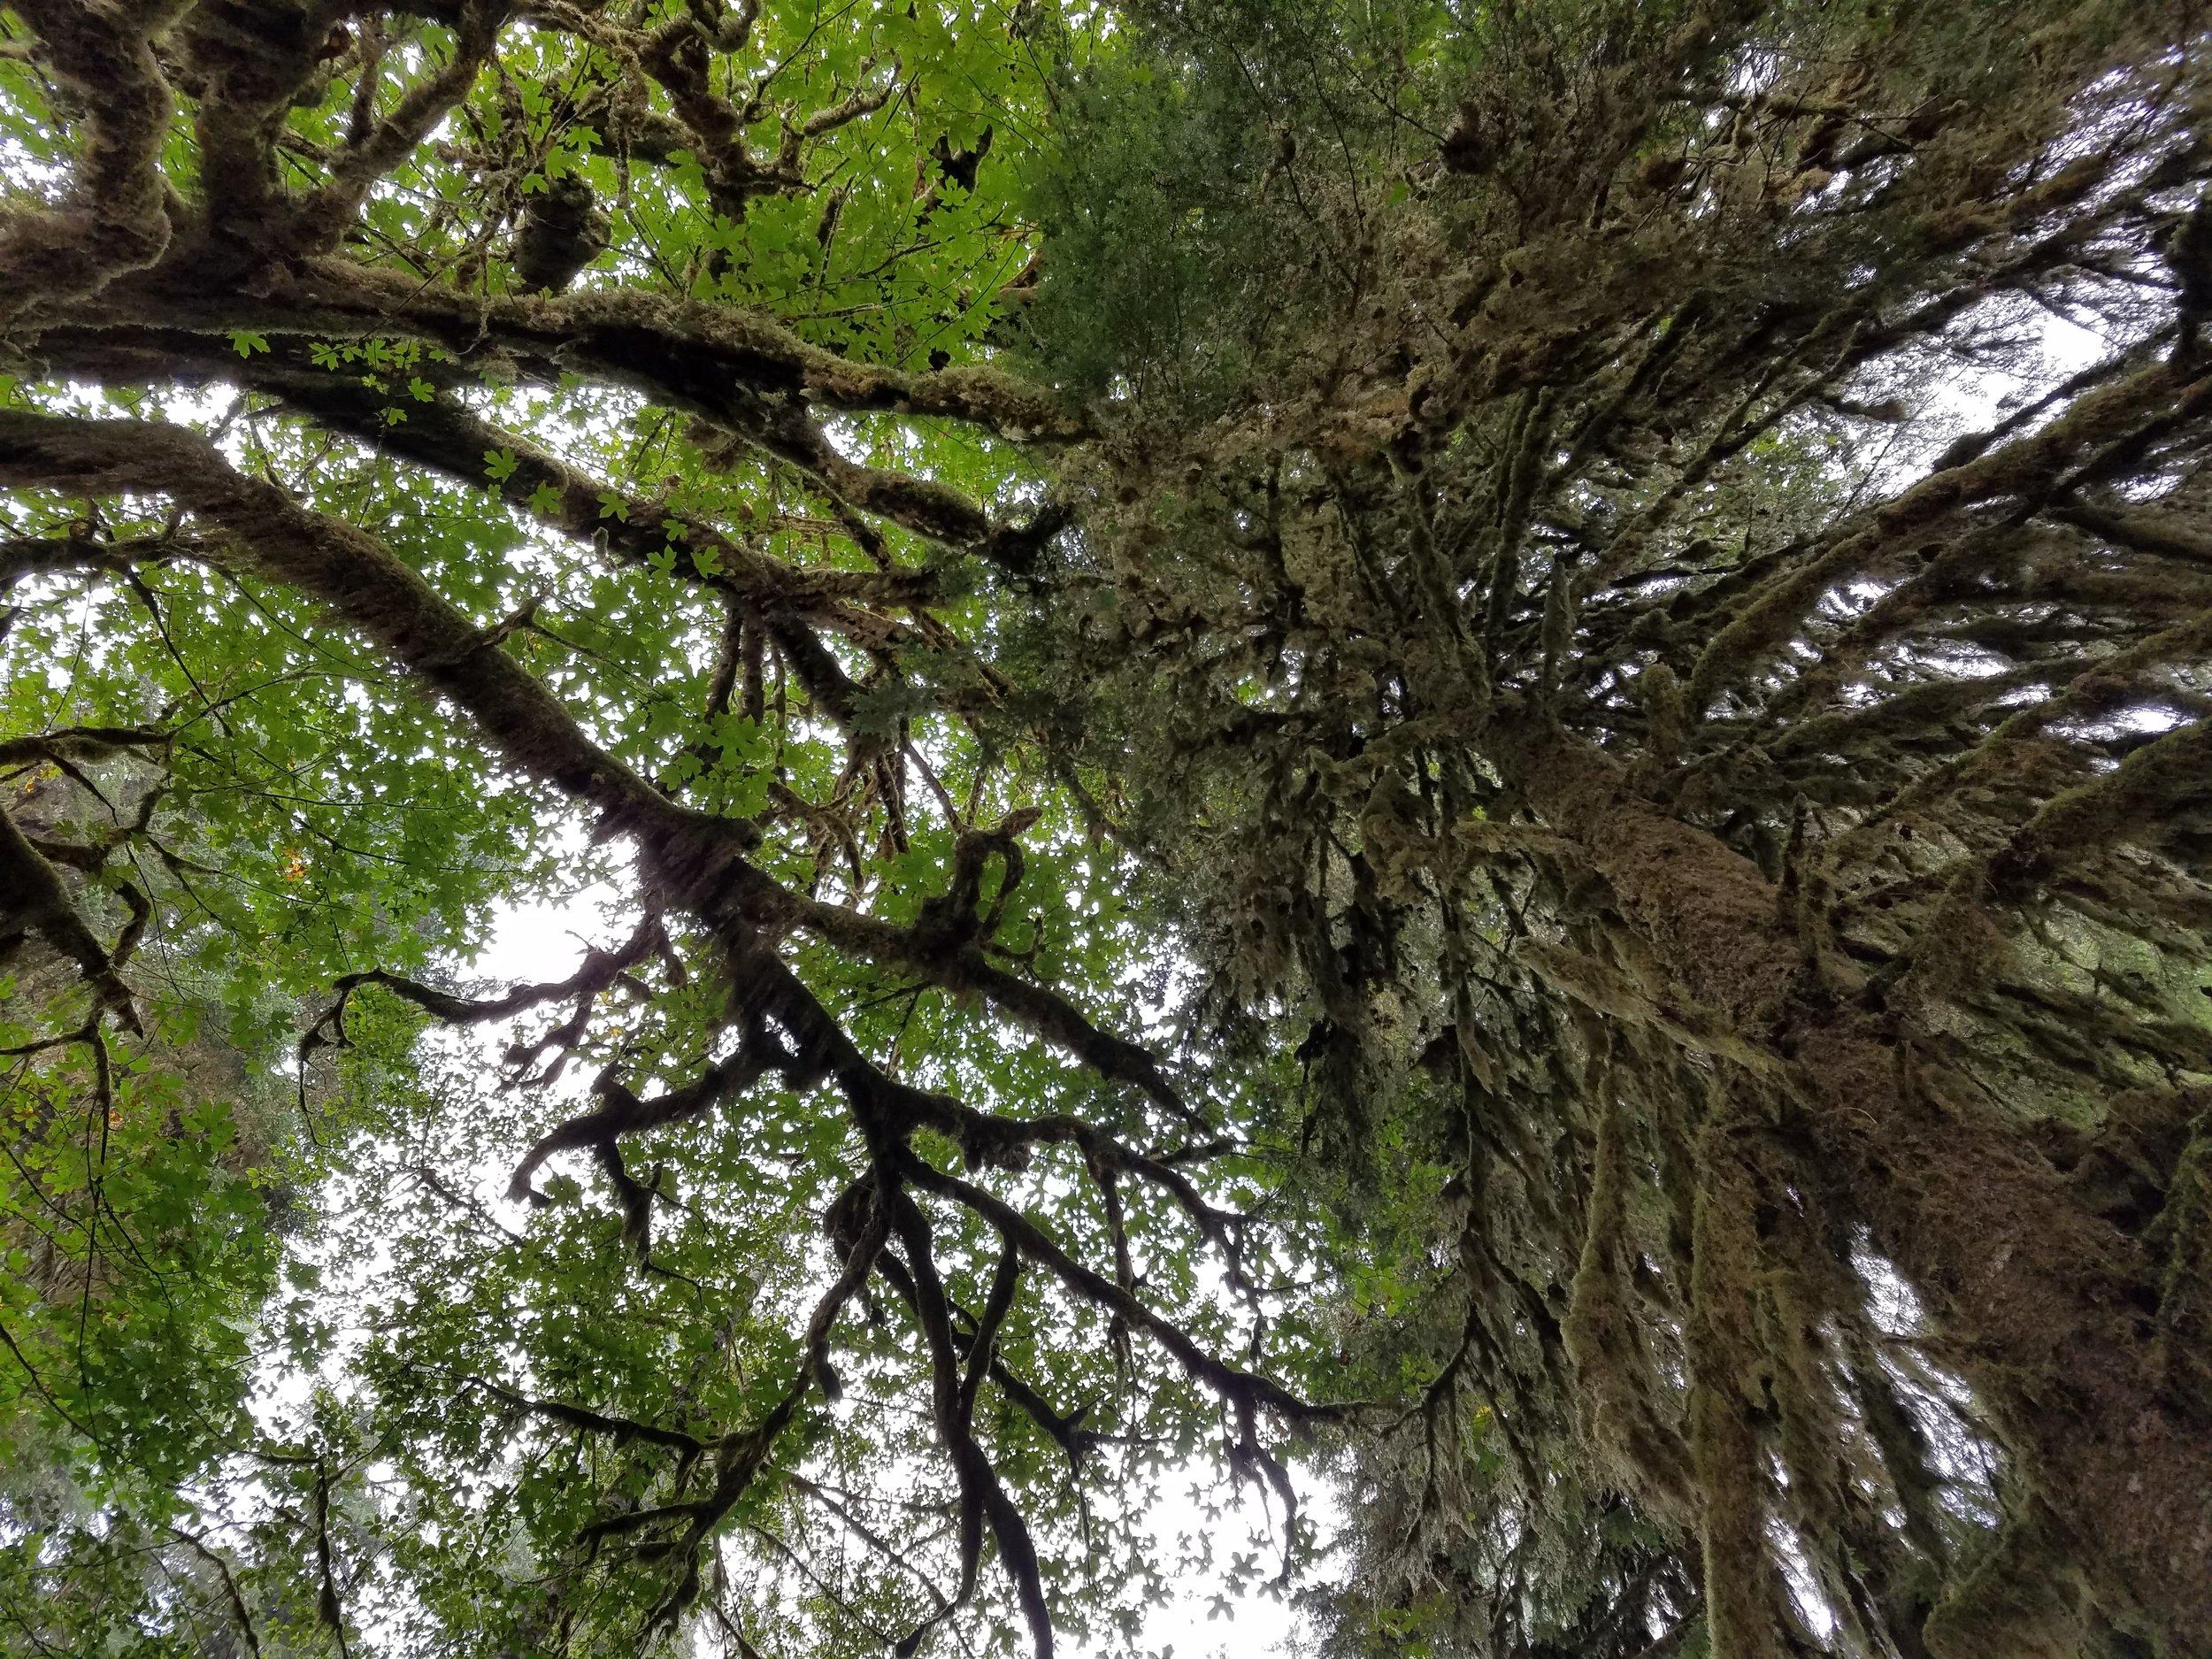 Quinault Rain Forest, WA Aug 2016